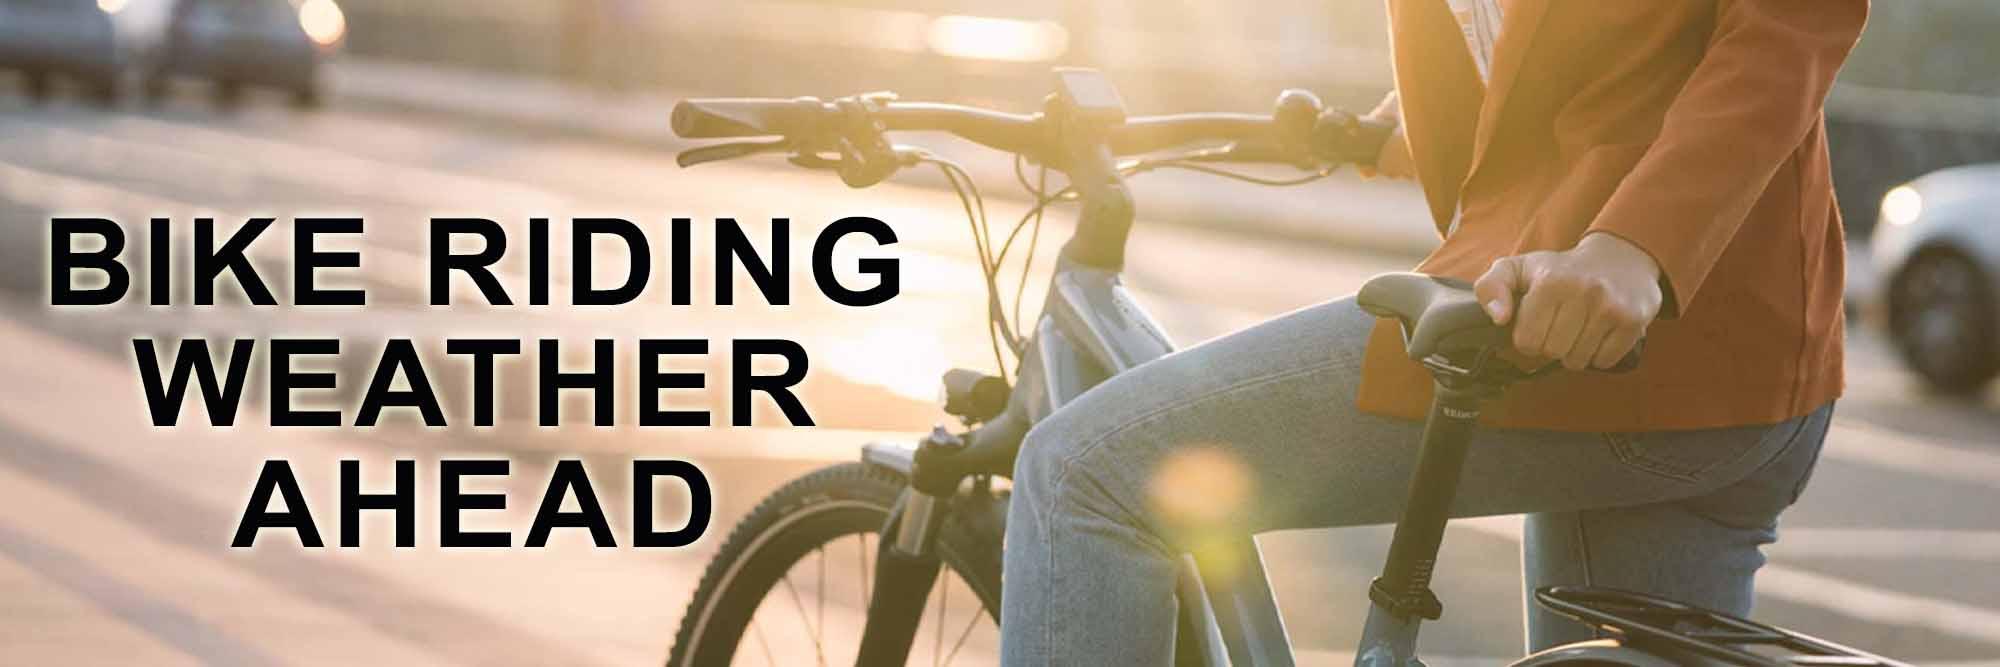 Bike Riding Weather Ahead